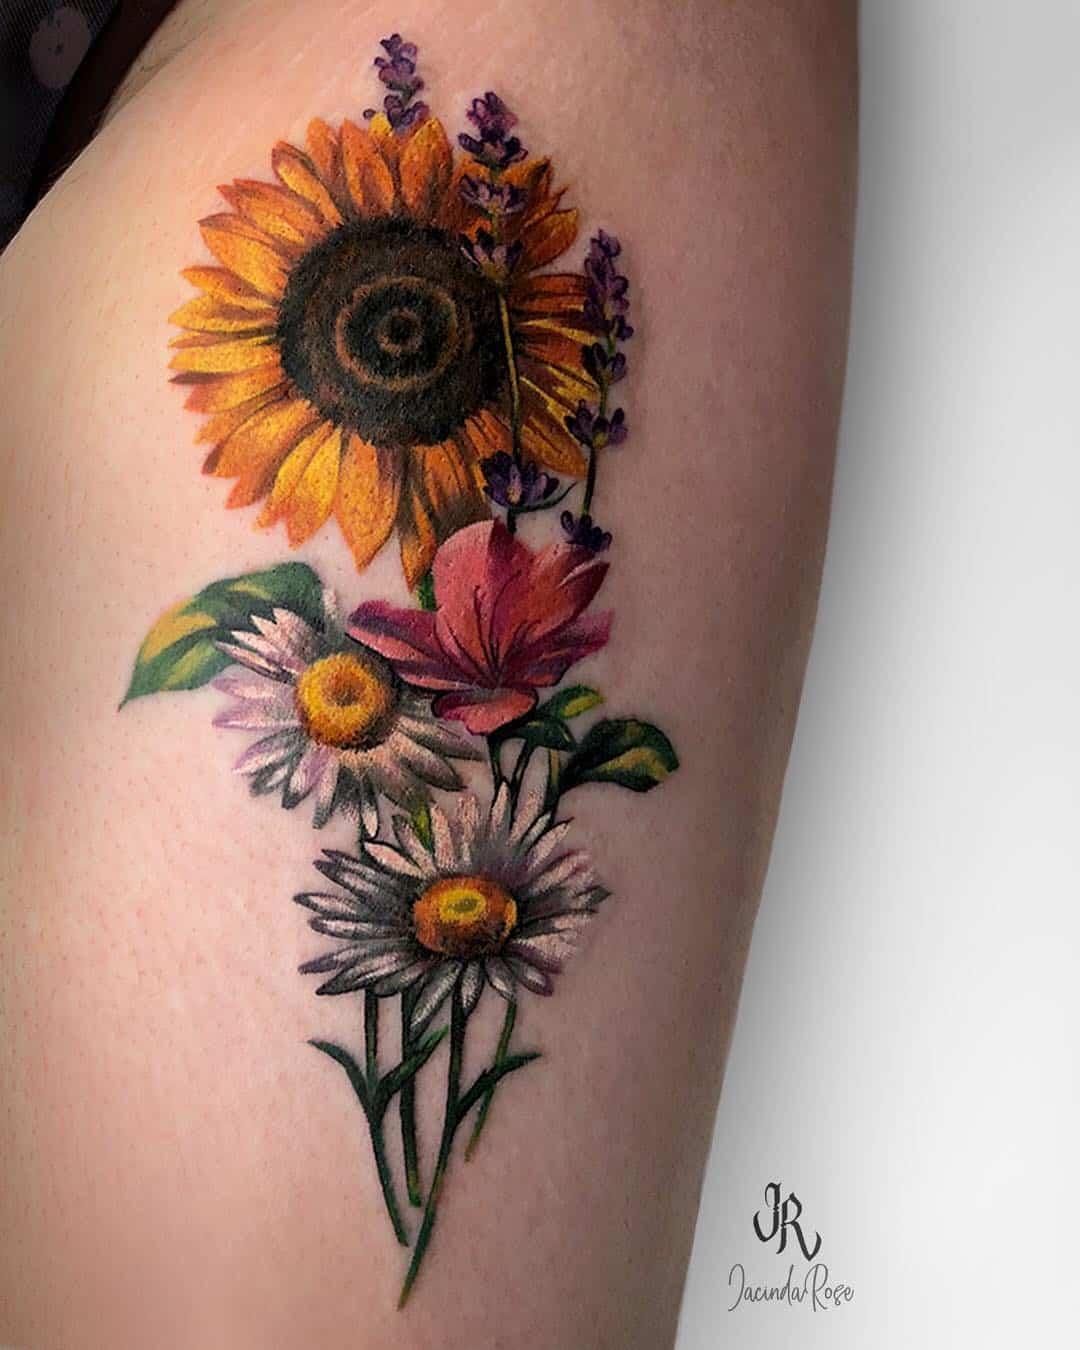 Sunflower Tattoo Wrist Small Flower Tattoos Novocom Top